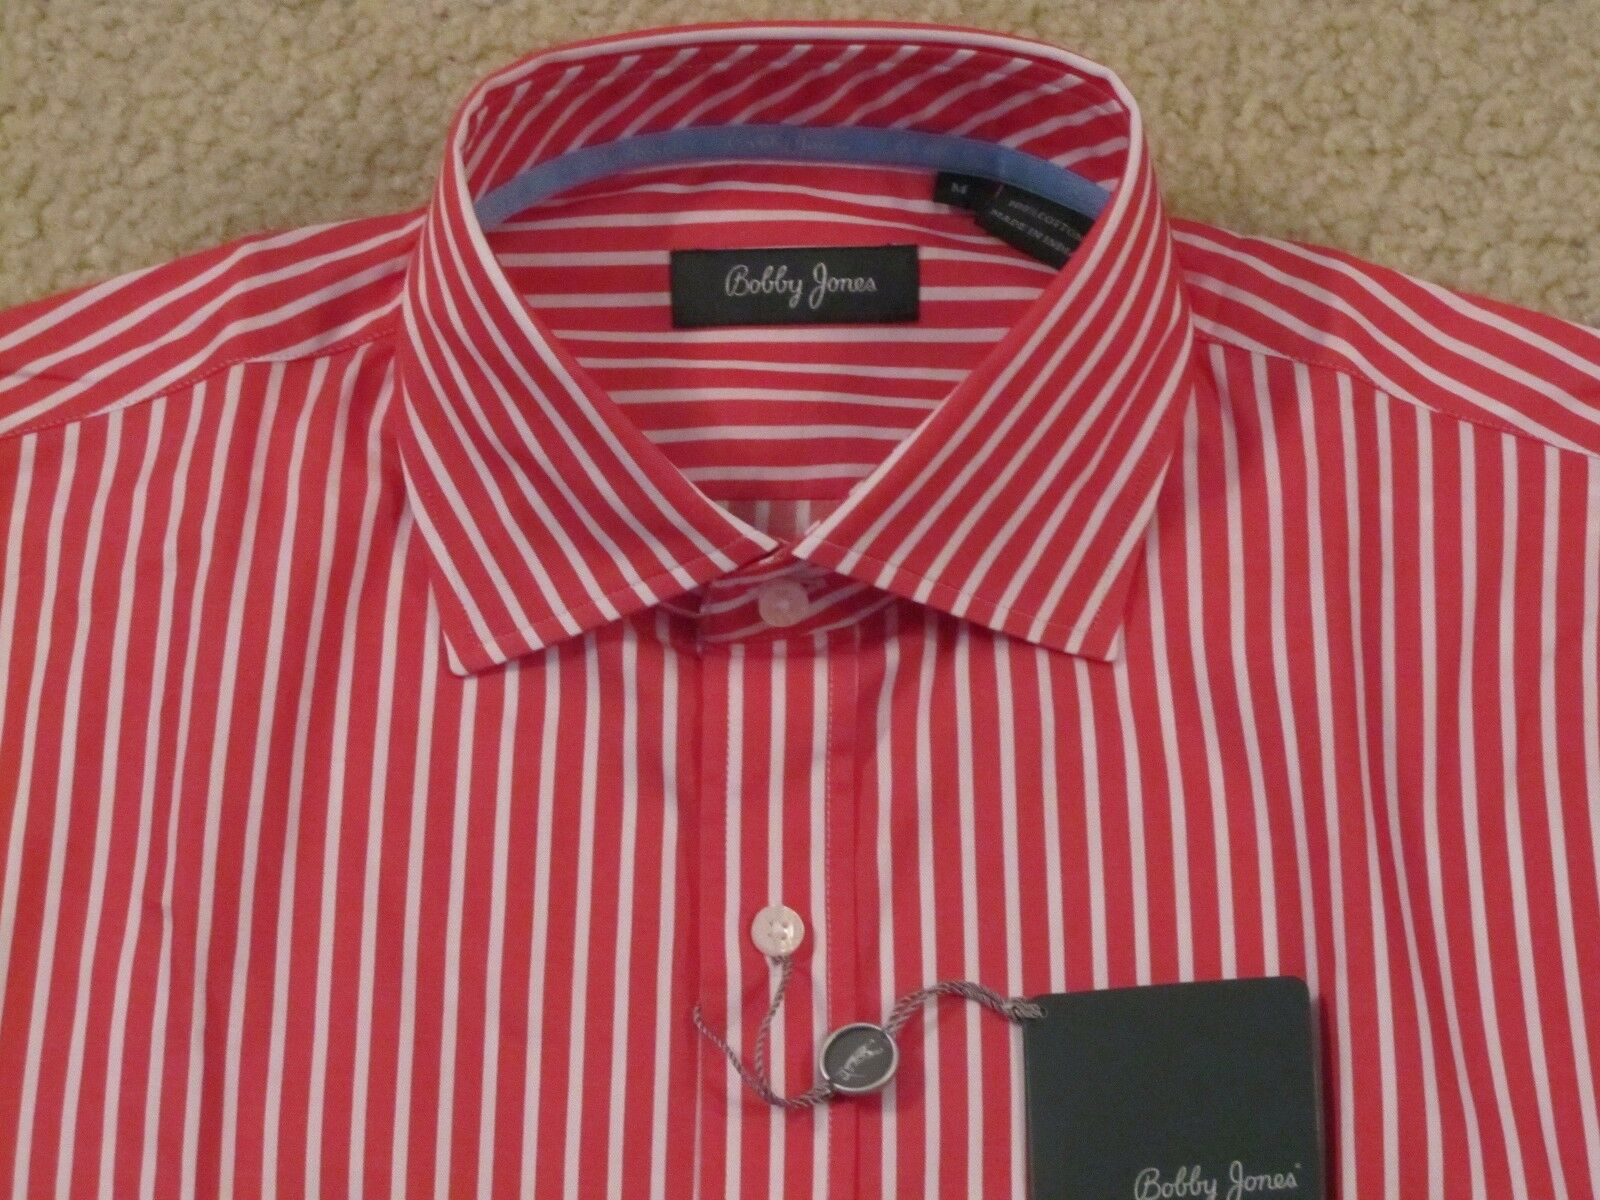 BOBBY JONES COTTON DRESS SHIRT -MADE IN INDIA - MEDIUM -NEWwTAGS- FREE SHIP